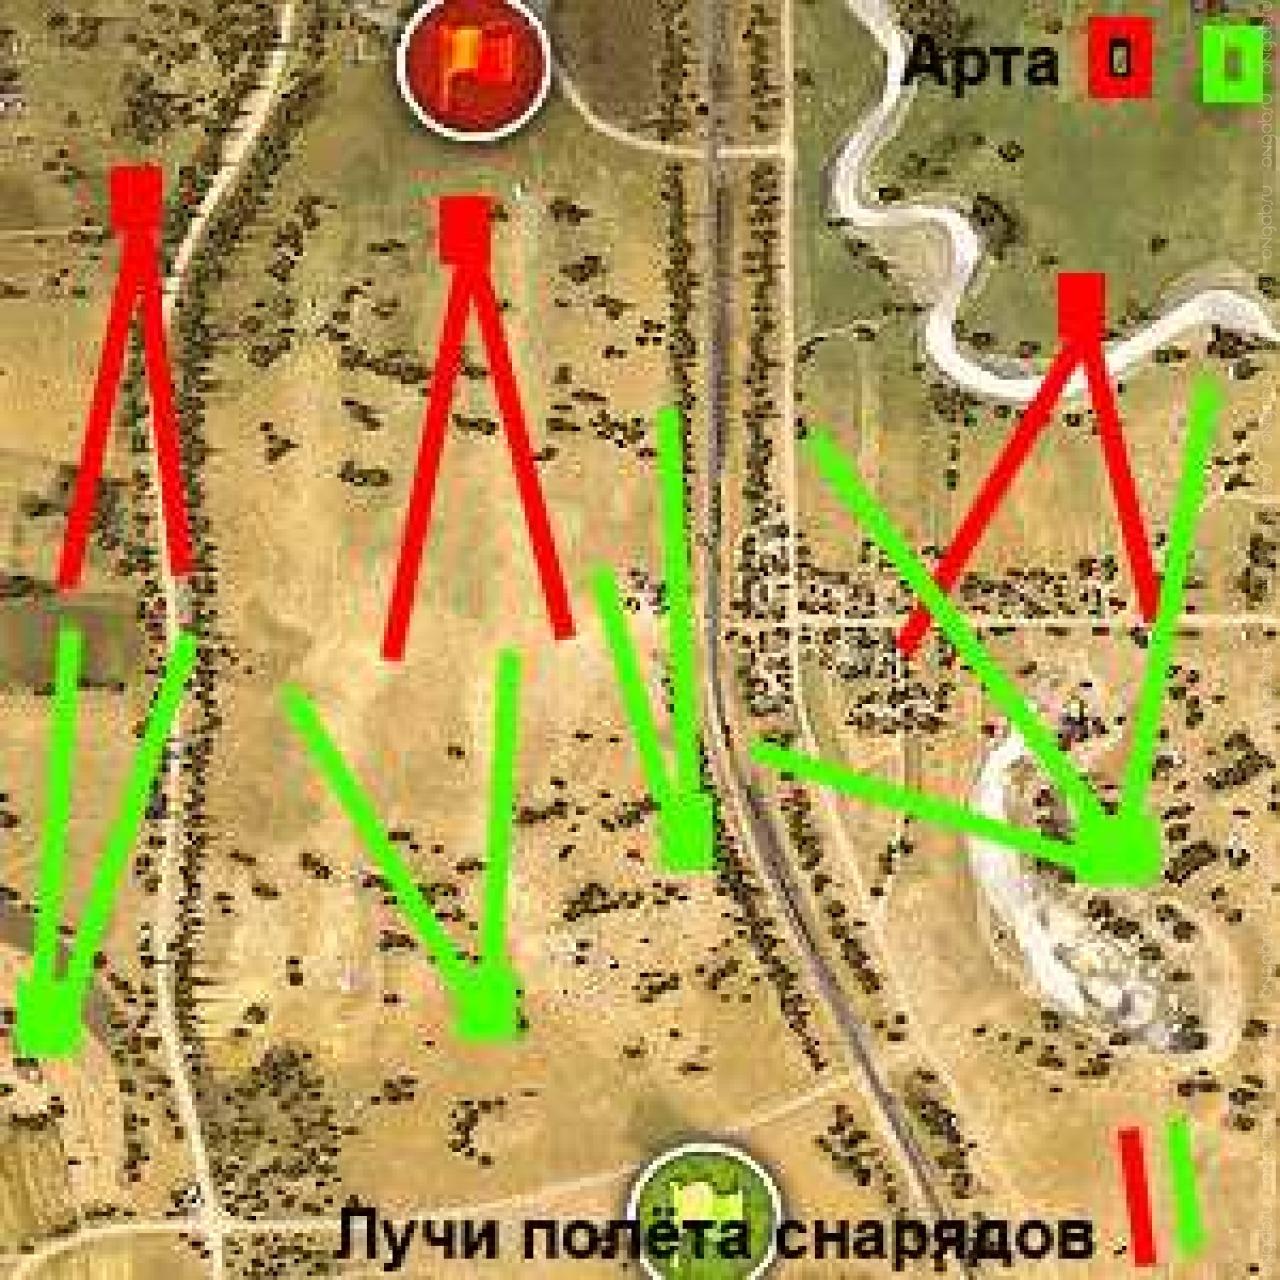 World Of Tanks Стихи про Арту - картинка 1